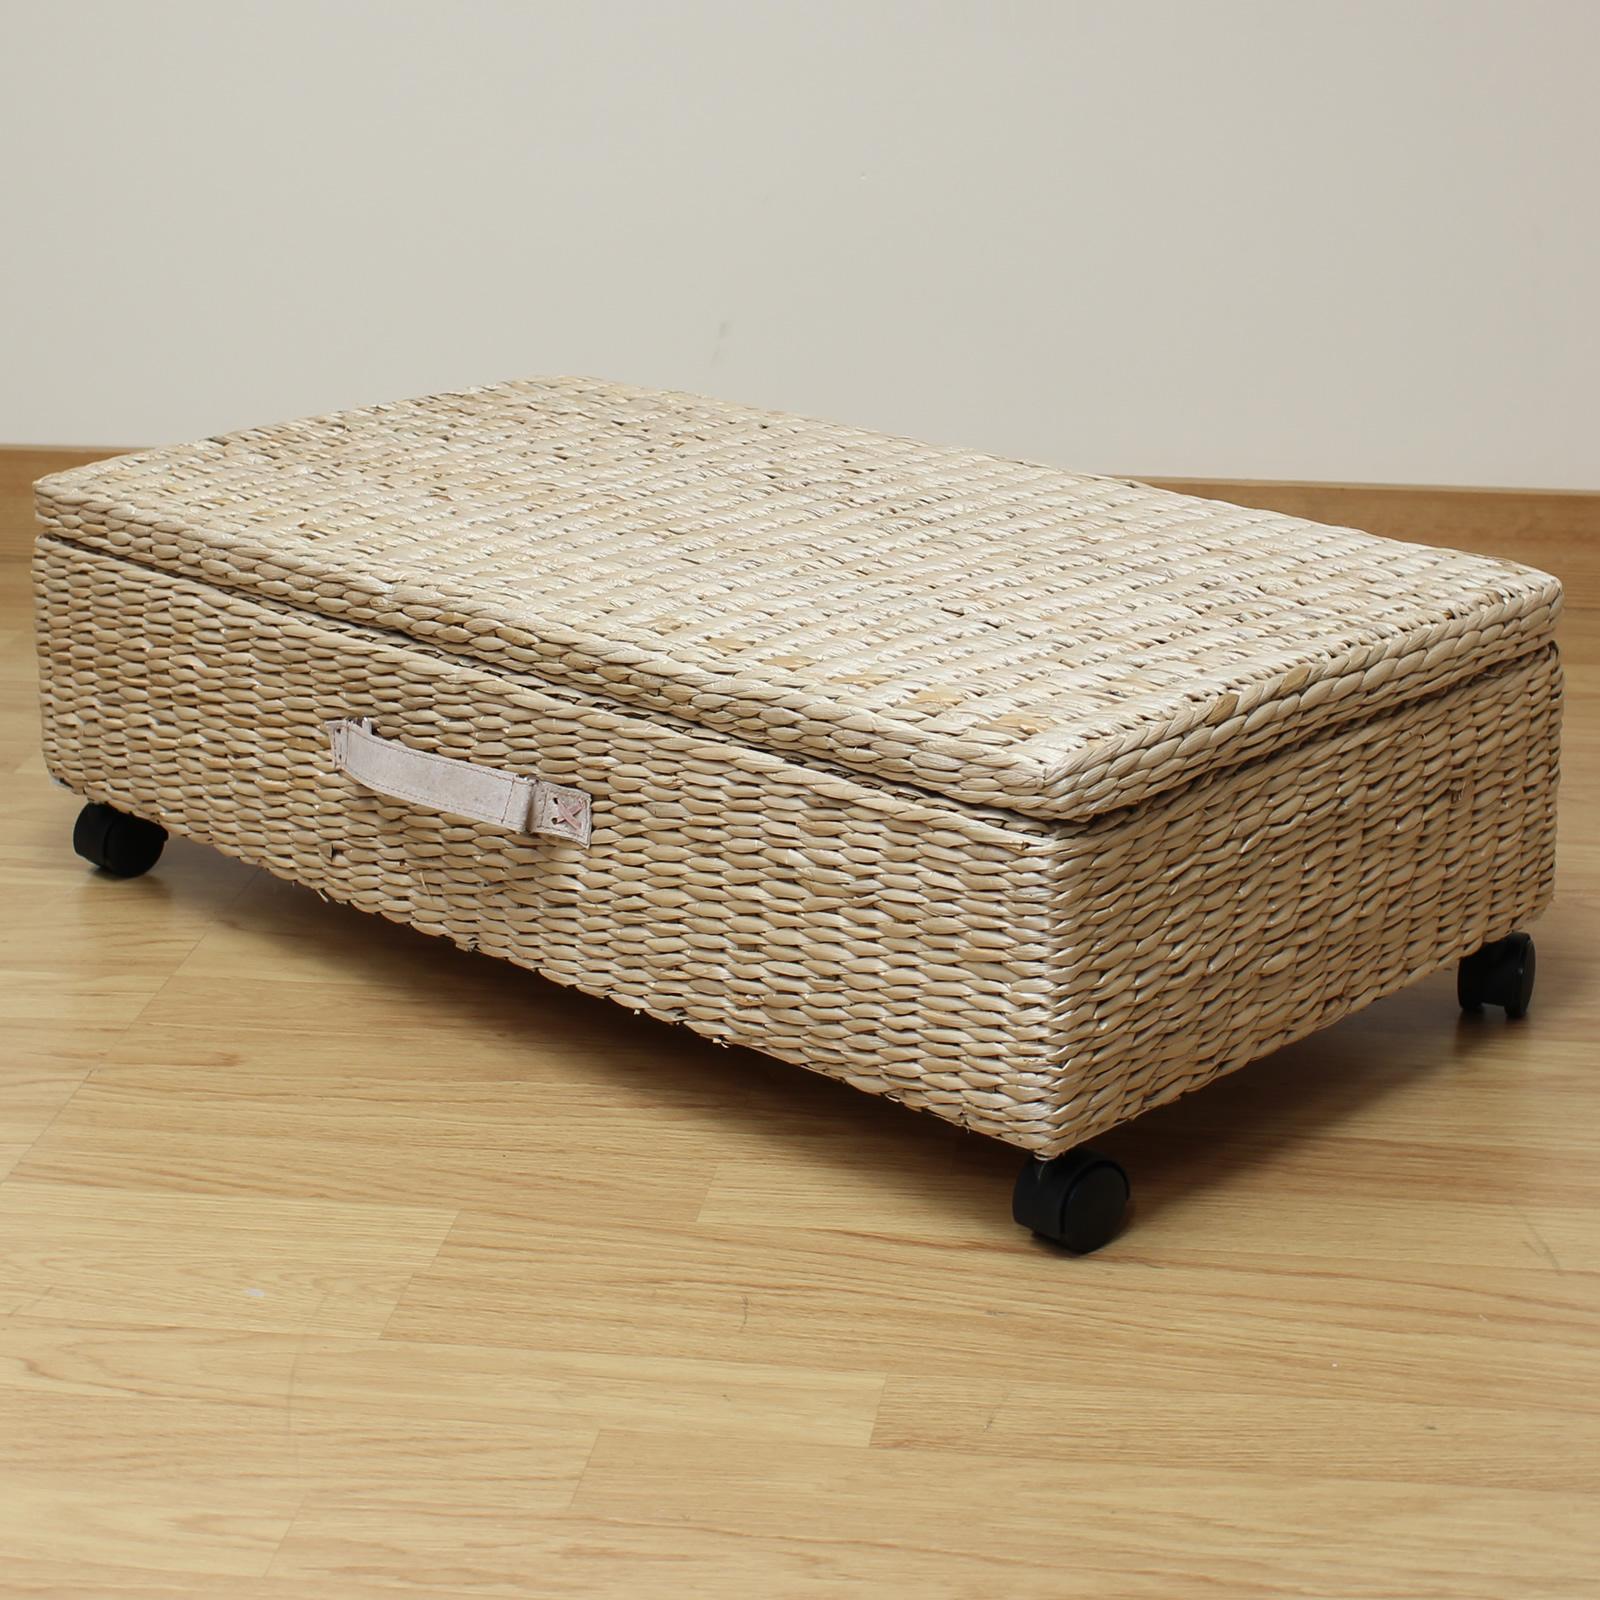 Sentinel Hartleys Large Under Bed Storage Box Chest Shoes Bedding Blanket Underbed Trunk